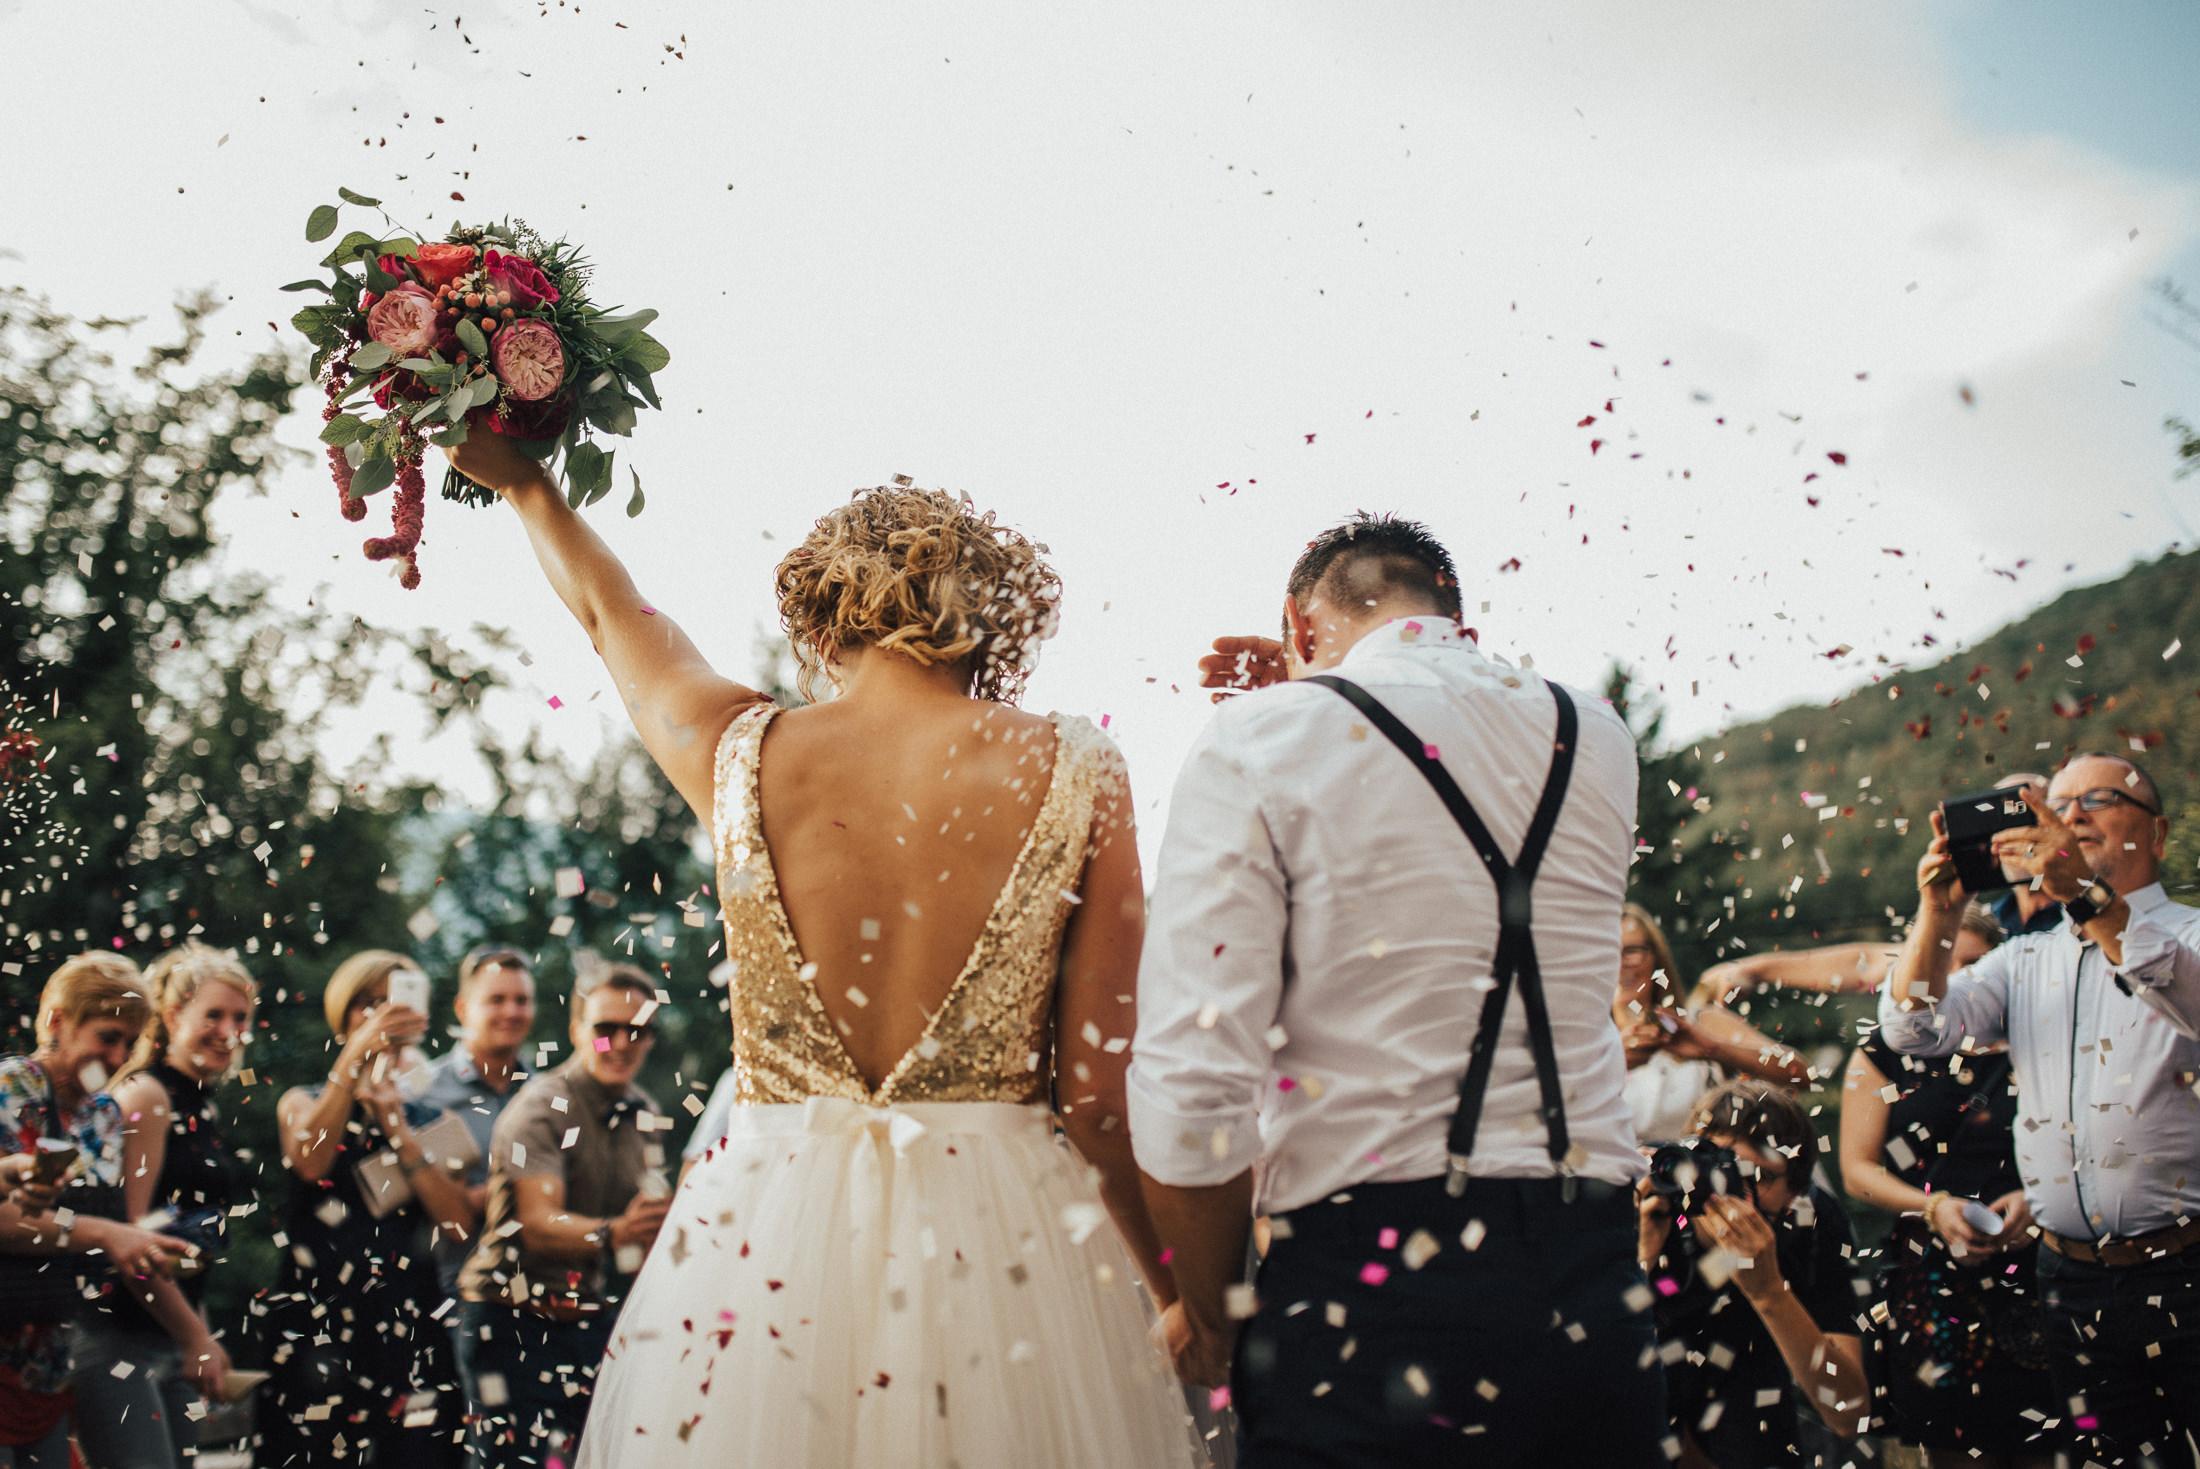 foto video matrimonio borgosesia